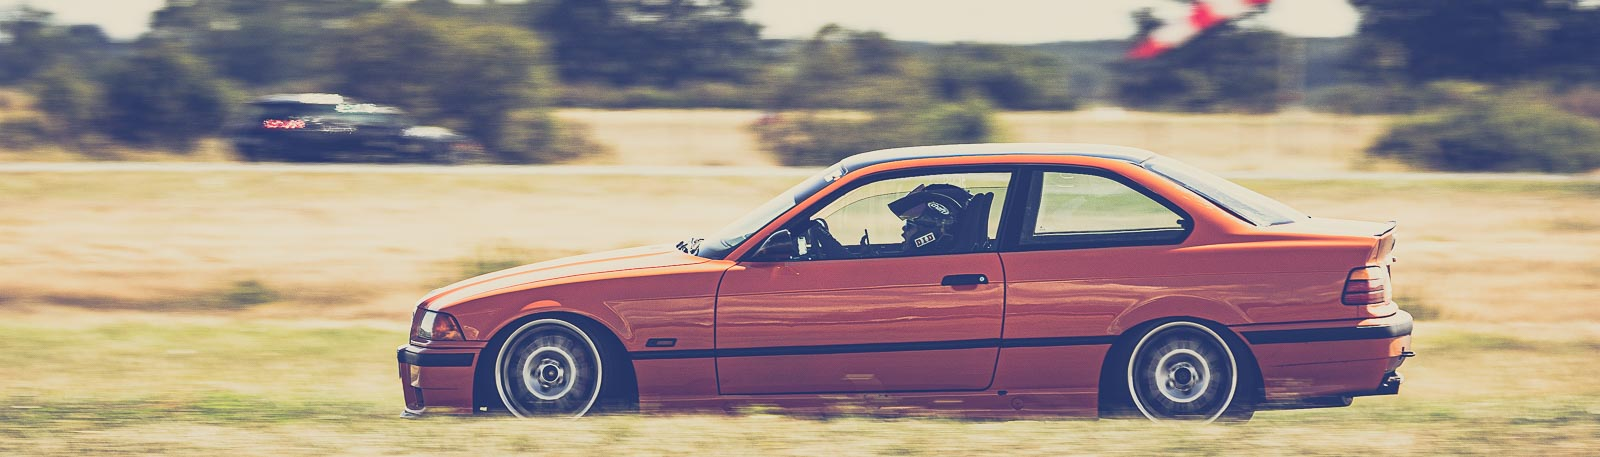 photographe automobile